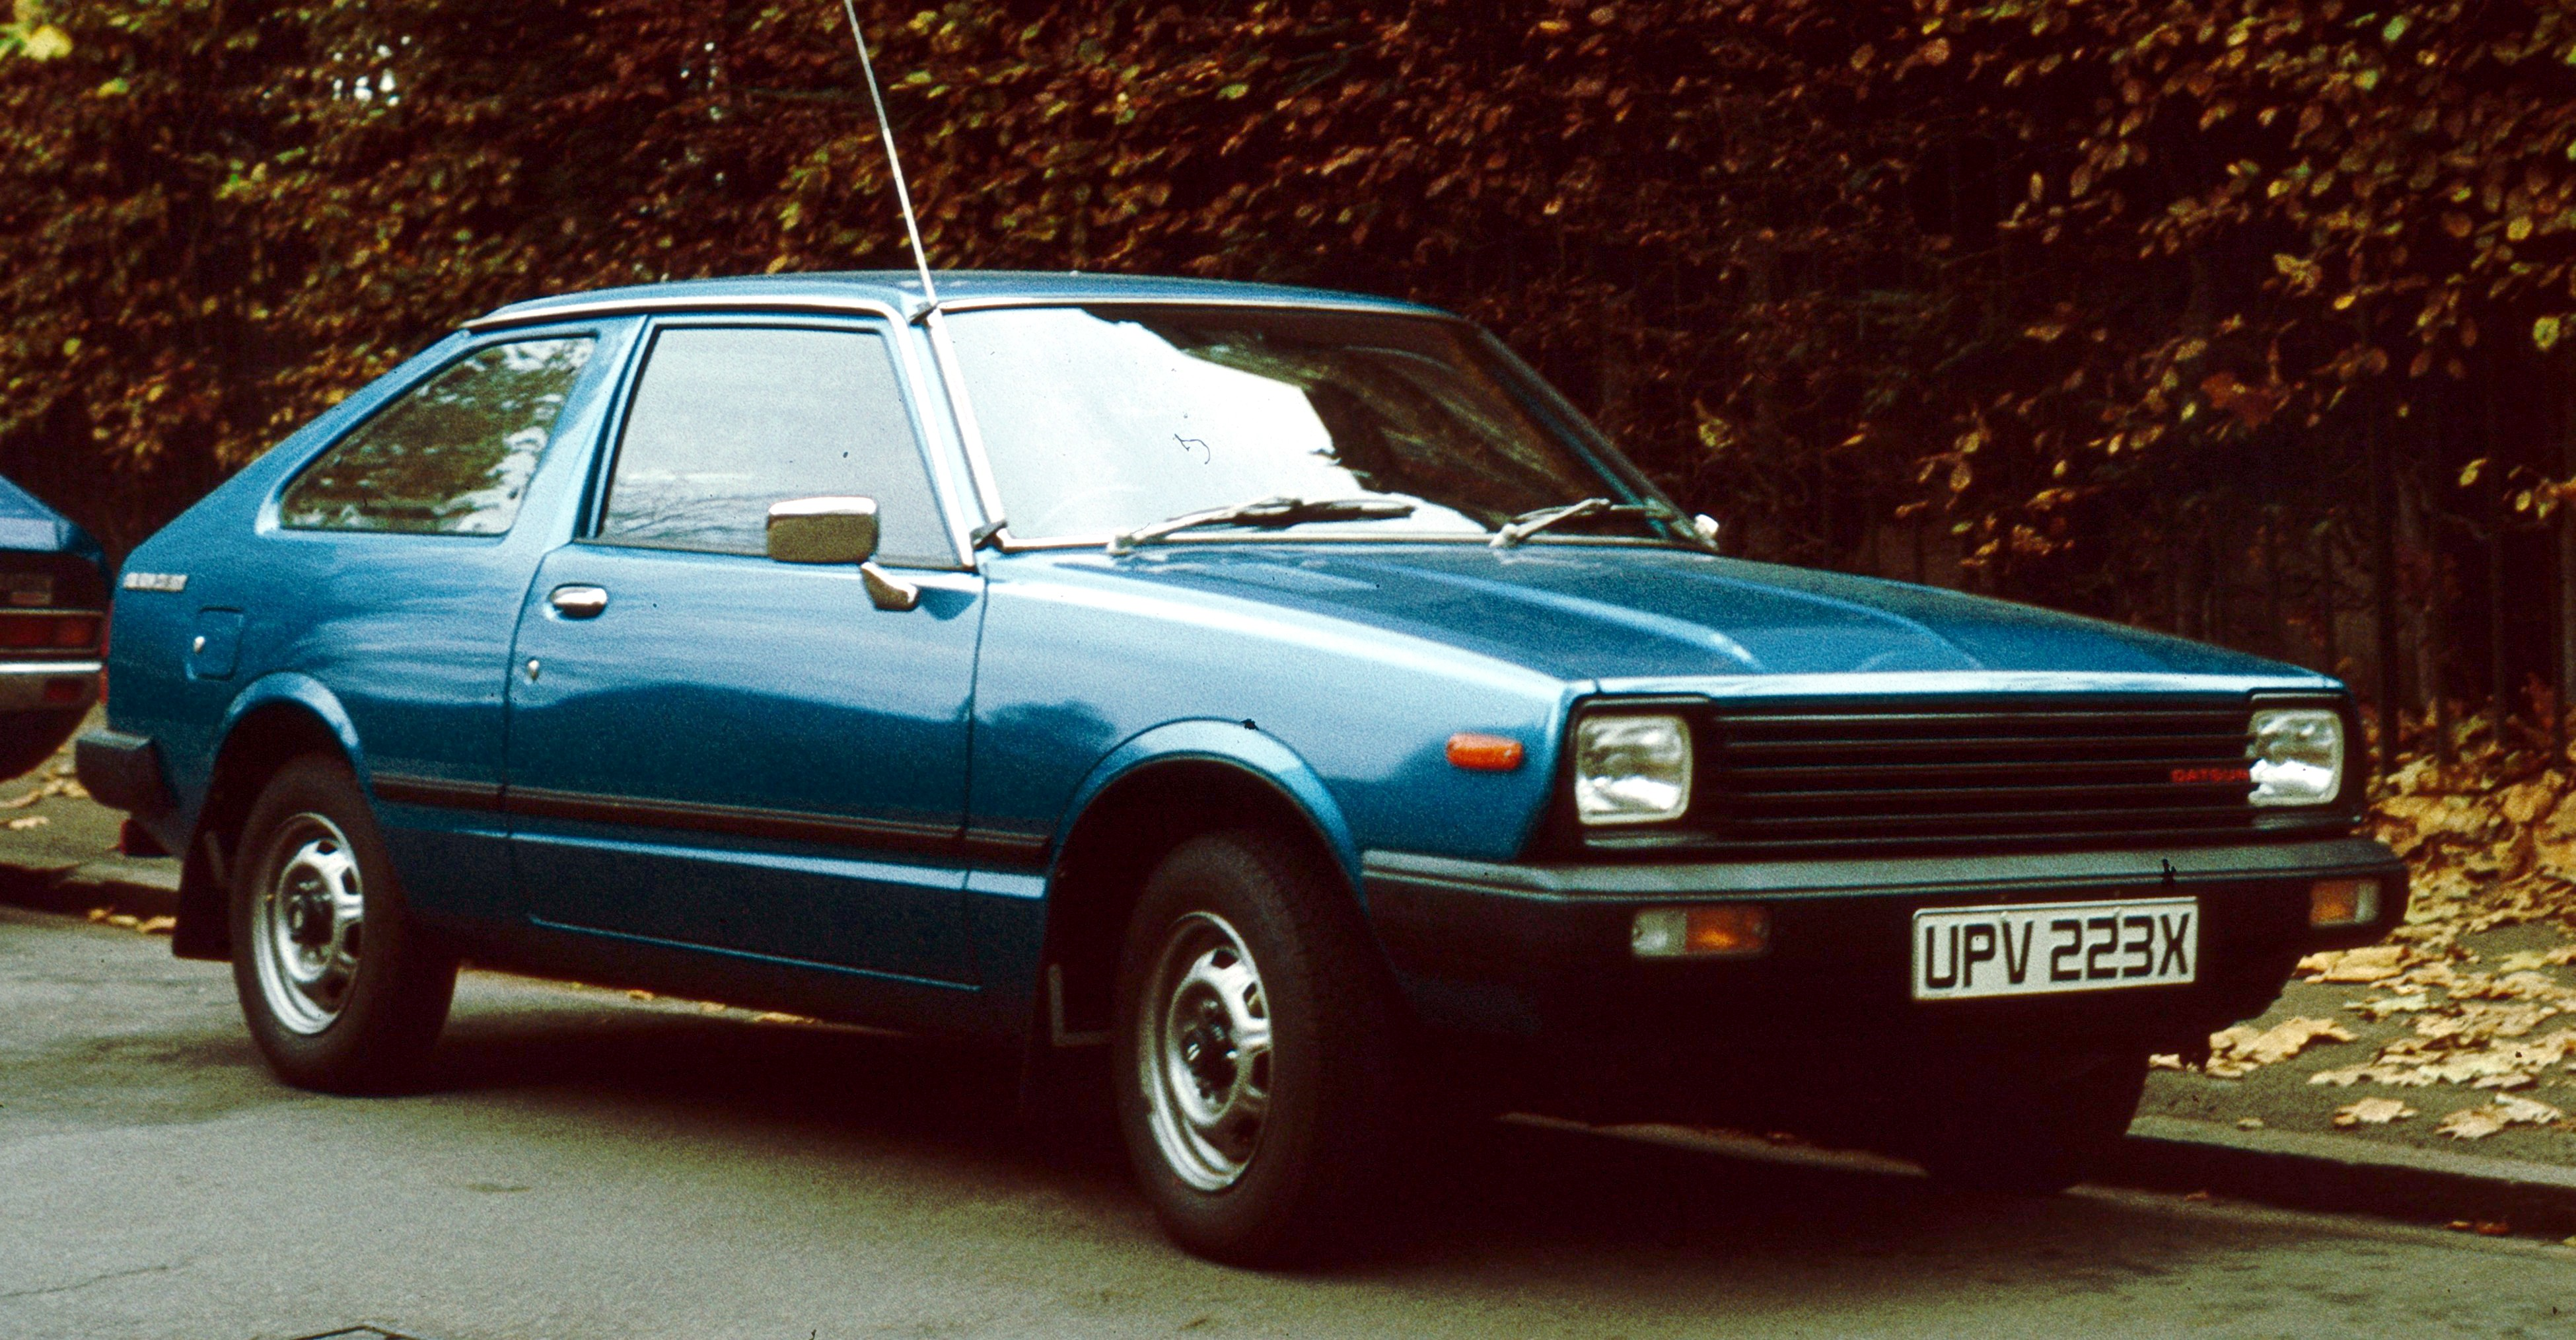 Nissan Pulsar II (N12) 1982 - 1986 Cabriolet #1